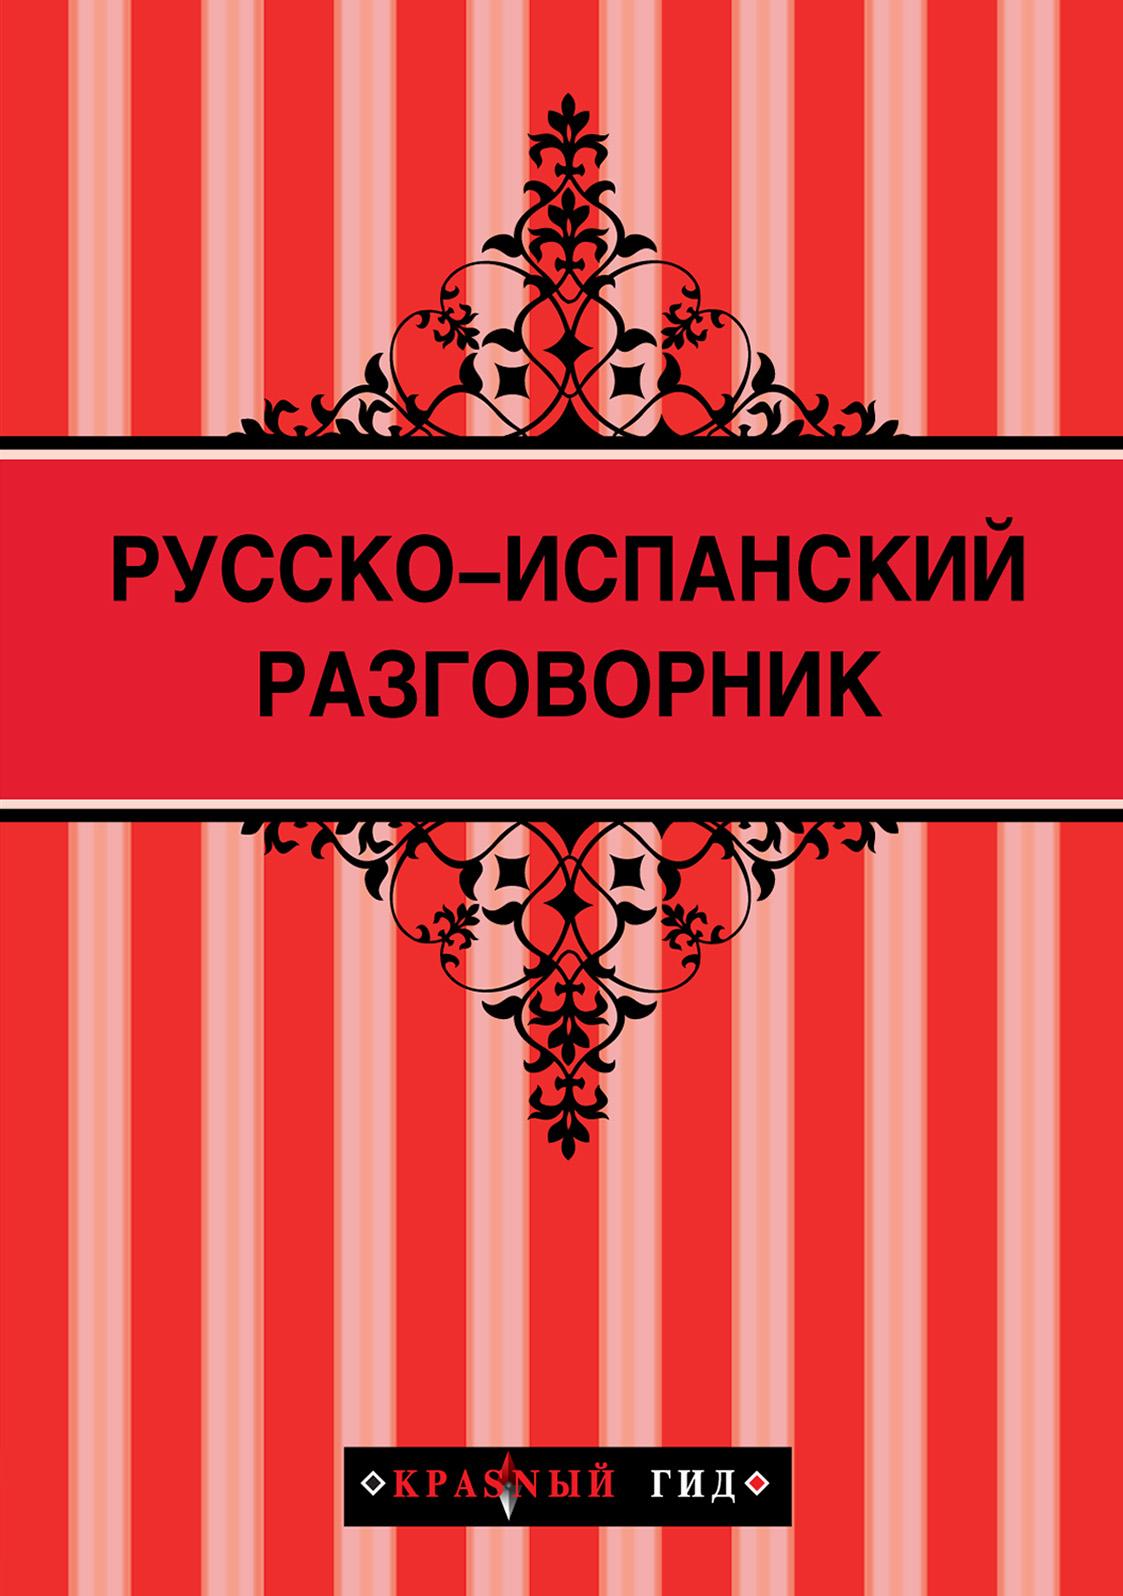 Отсутствует Русско-испанский разговорник отсутствует русско американский разговорник russian american english phrasebook